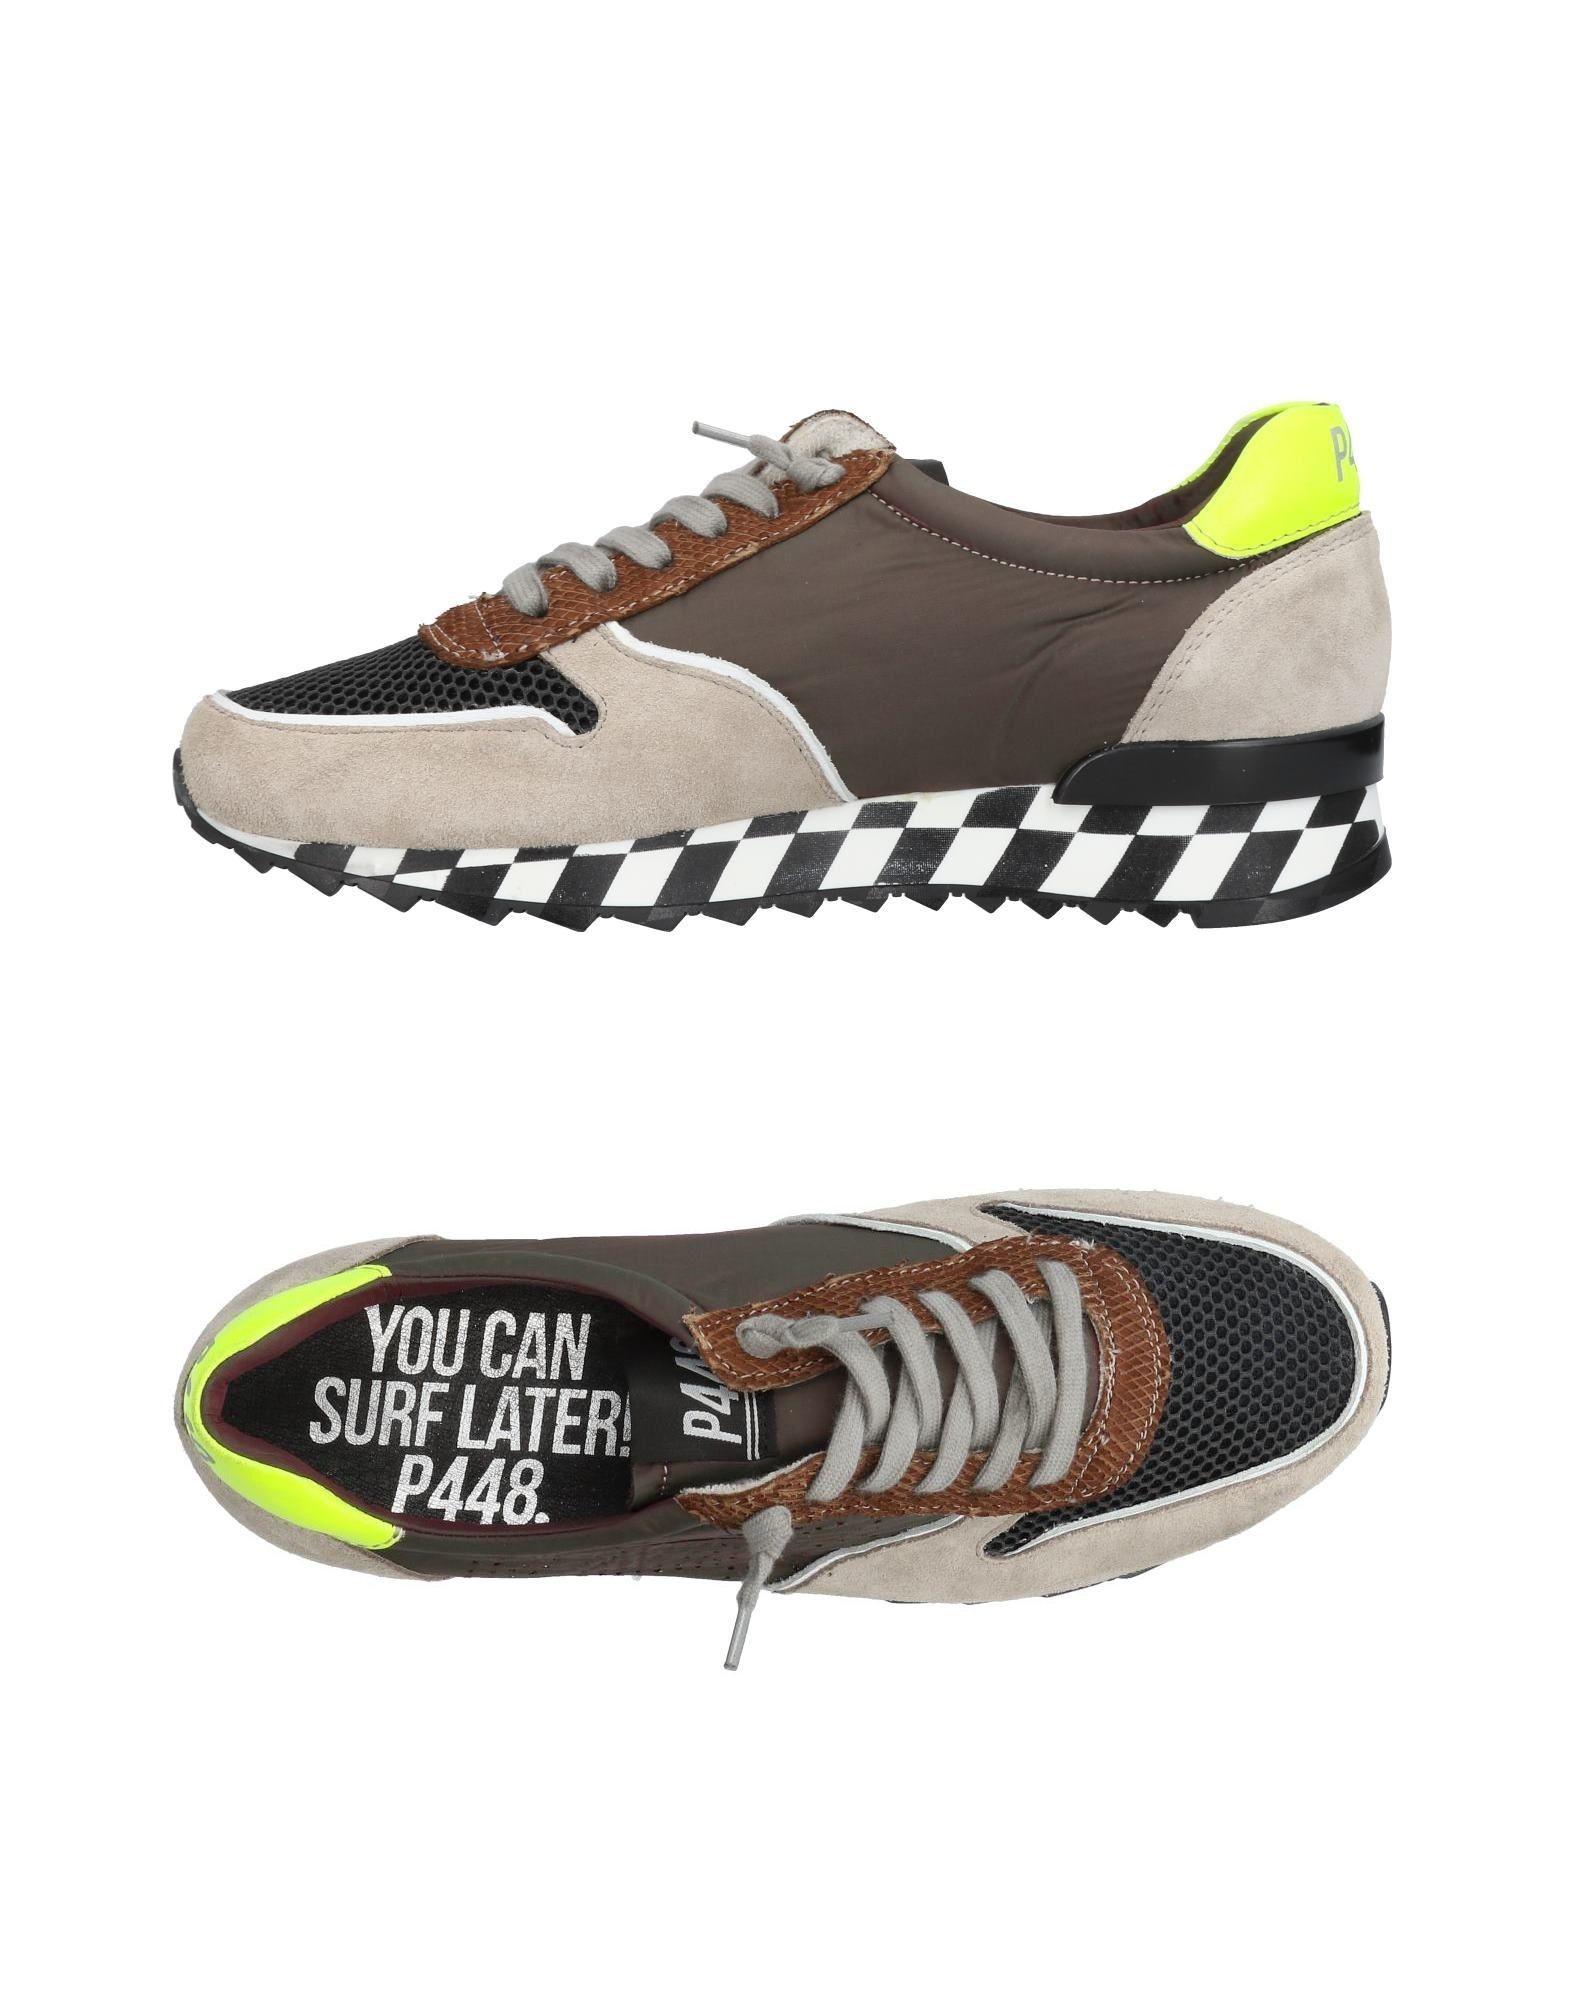 Sneakers P448 Homme - Sneakers P448 sur